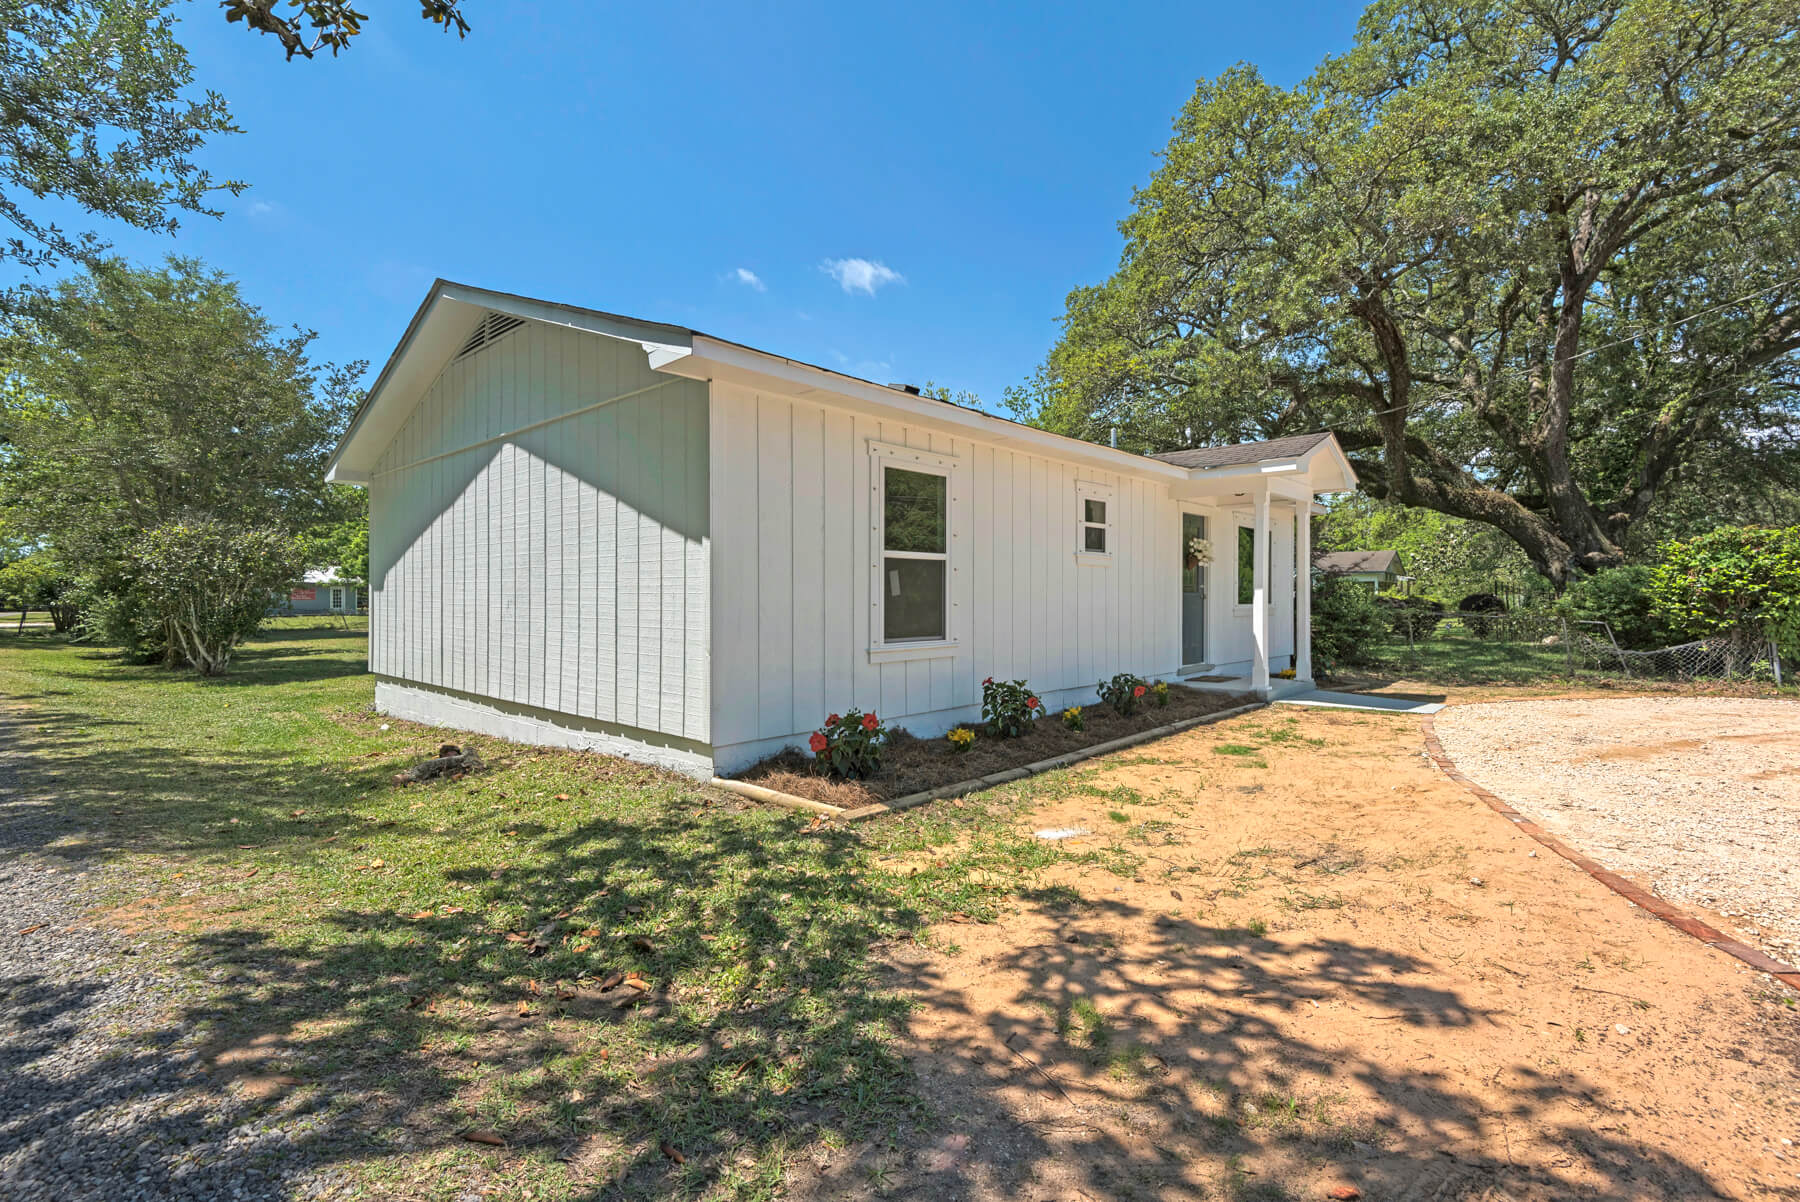 7466 Twin Beech Road Fairhope for Sale Urban Property Outside view 3